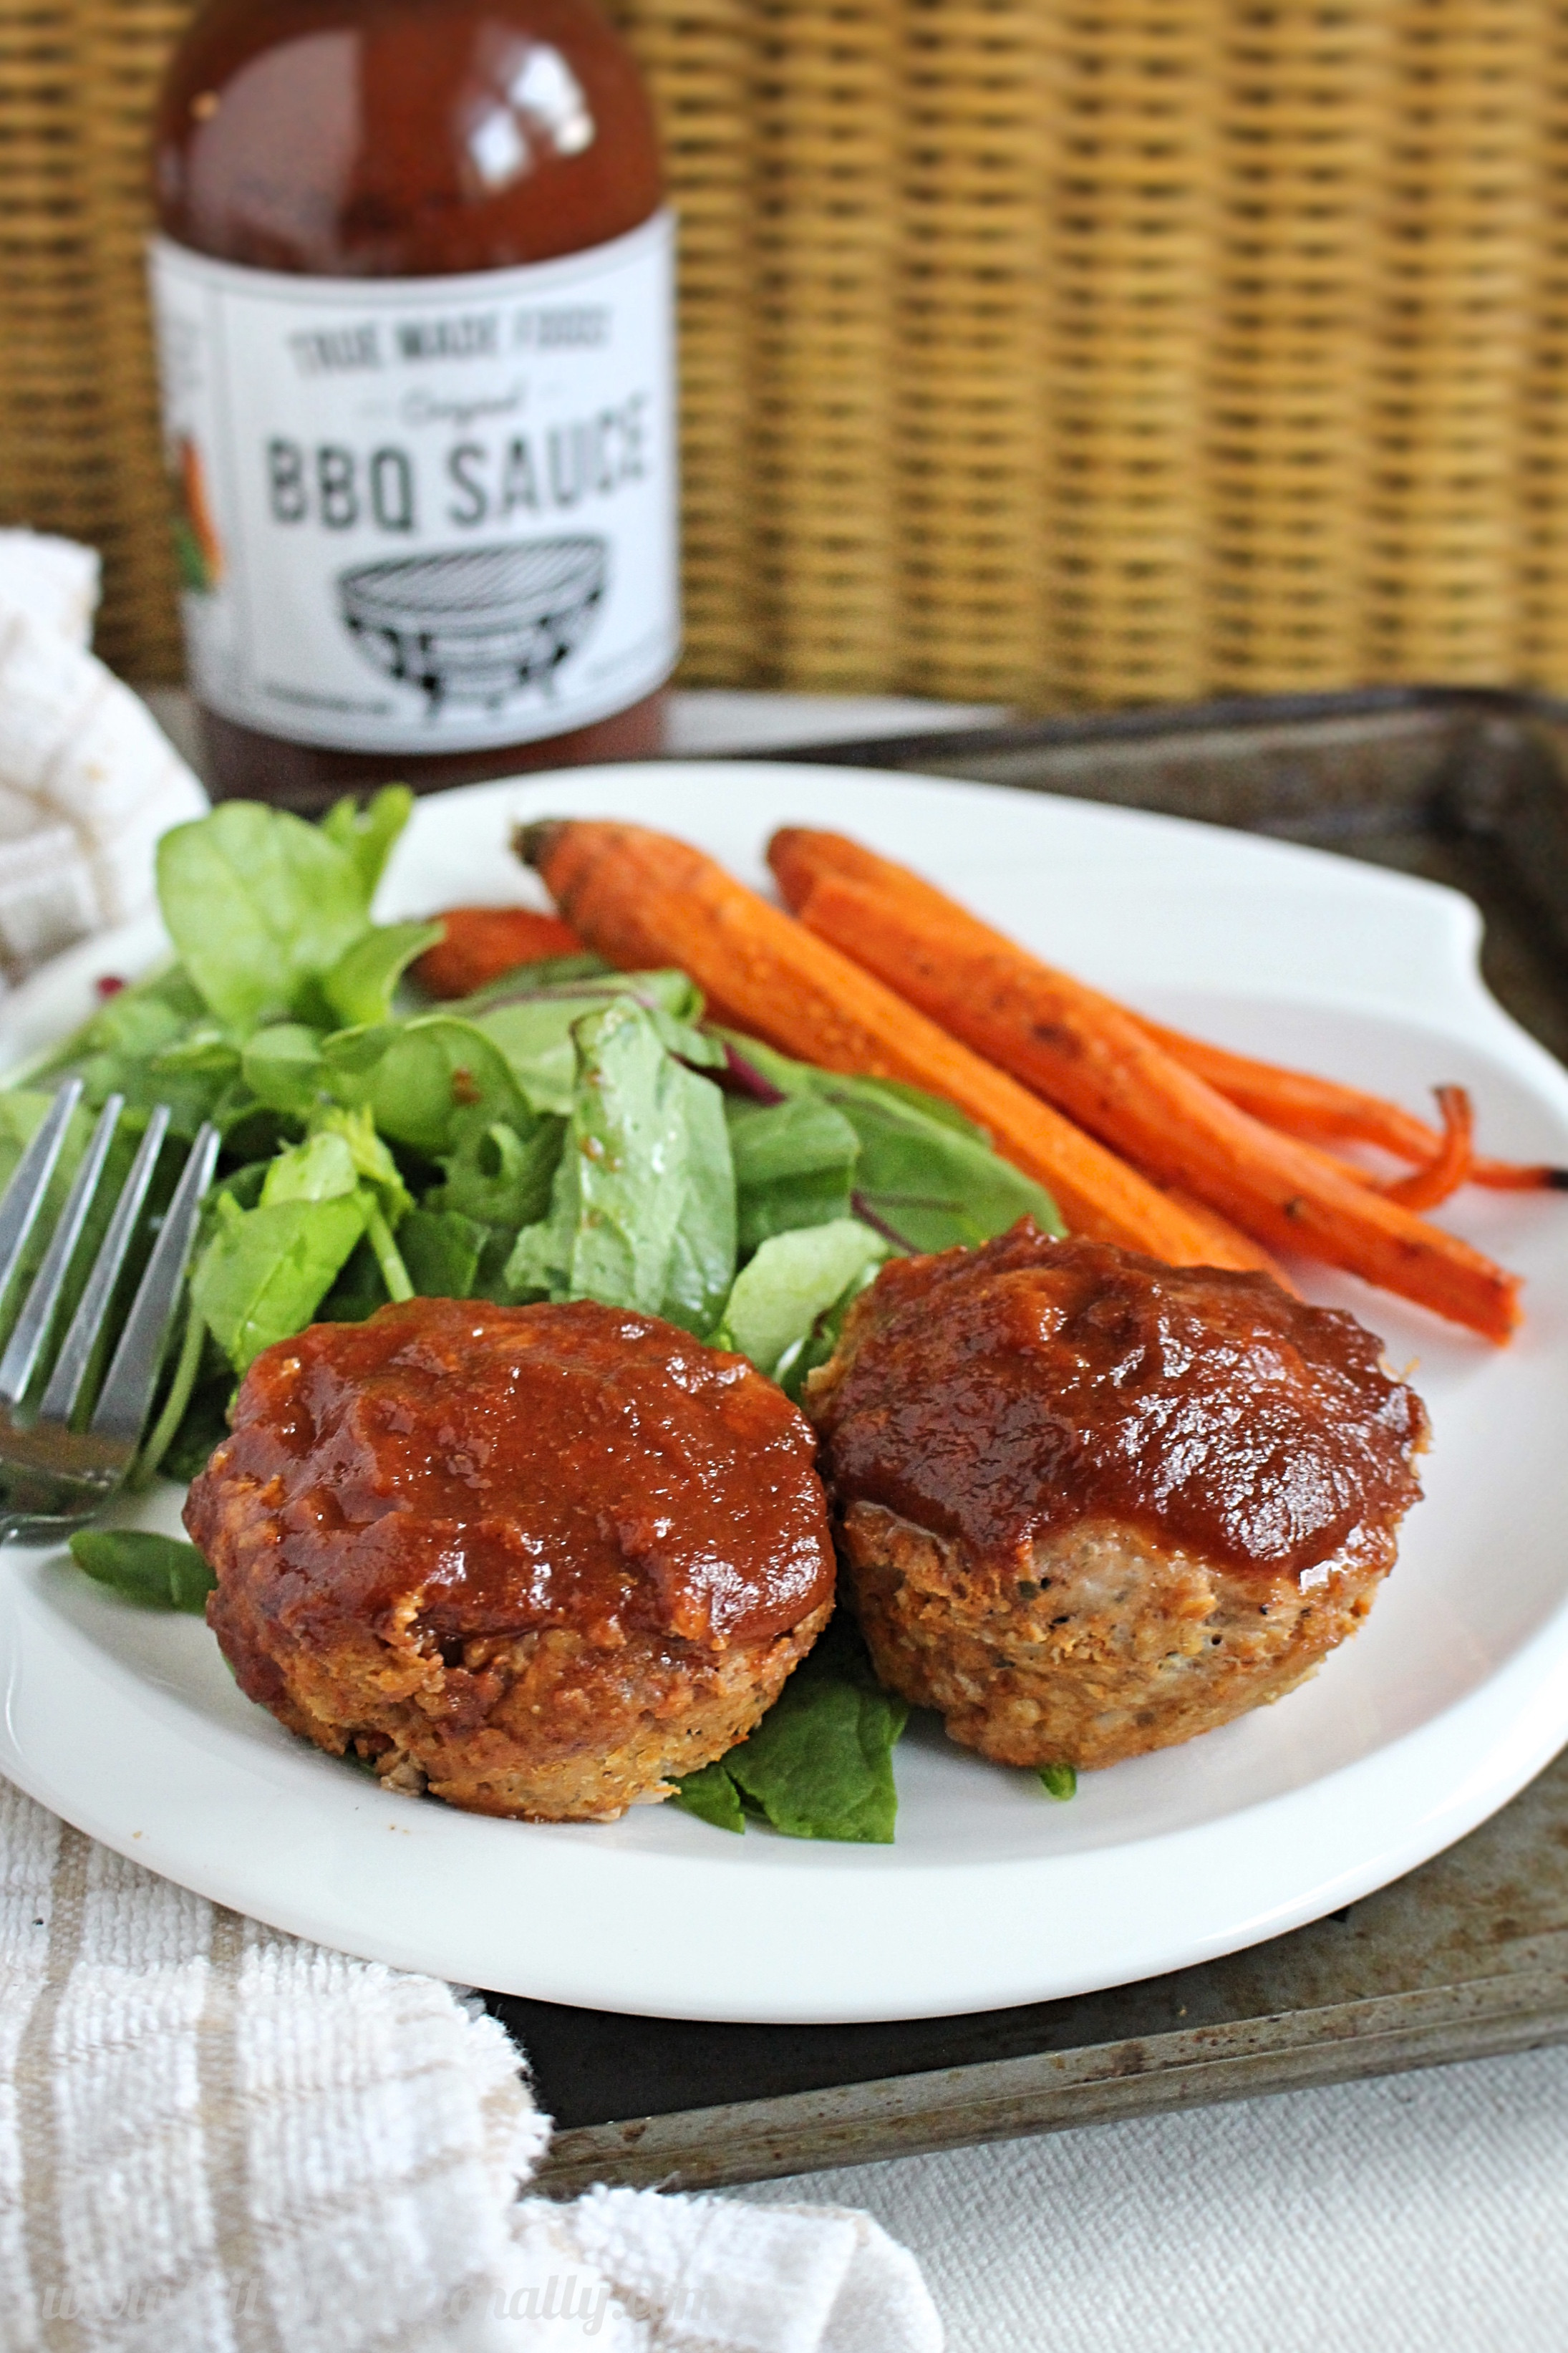 Healthy Meatloaf Muffins  Healthy Turkey Meatloaf Muffins Frugal Friday Week 6 C